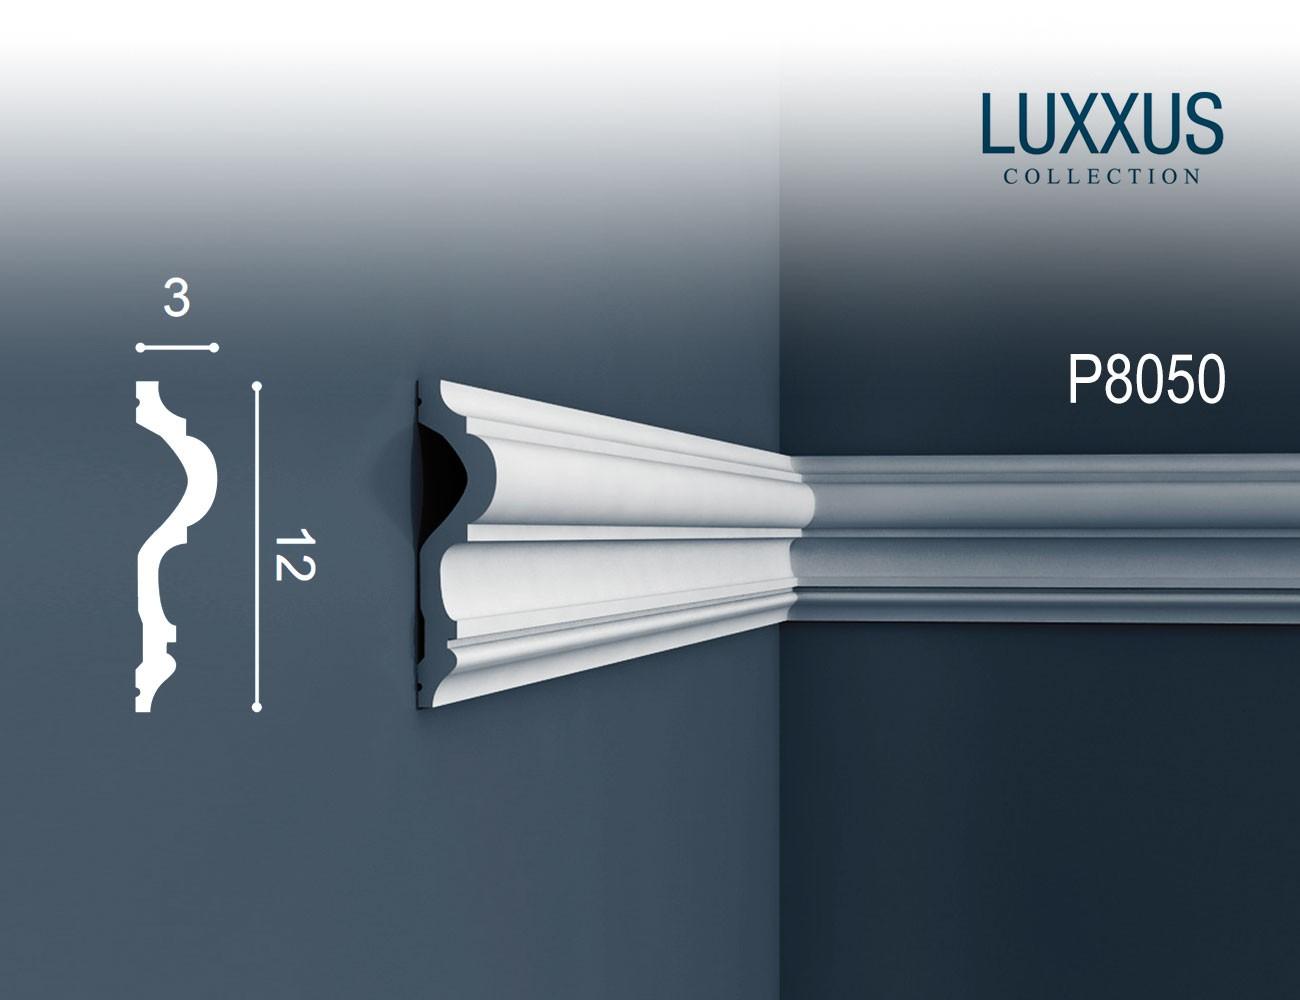 stuckprofil friesleiste rahmen orac decor p8050 luxxus wand leiste dekor profil relief leiste. Black Bedroom Furniture Sets. Home Design Ideas